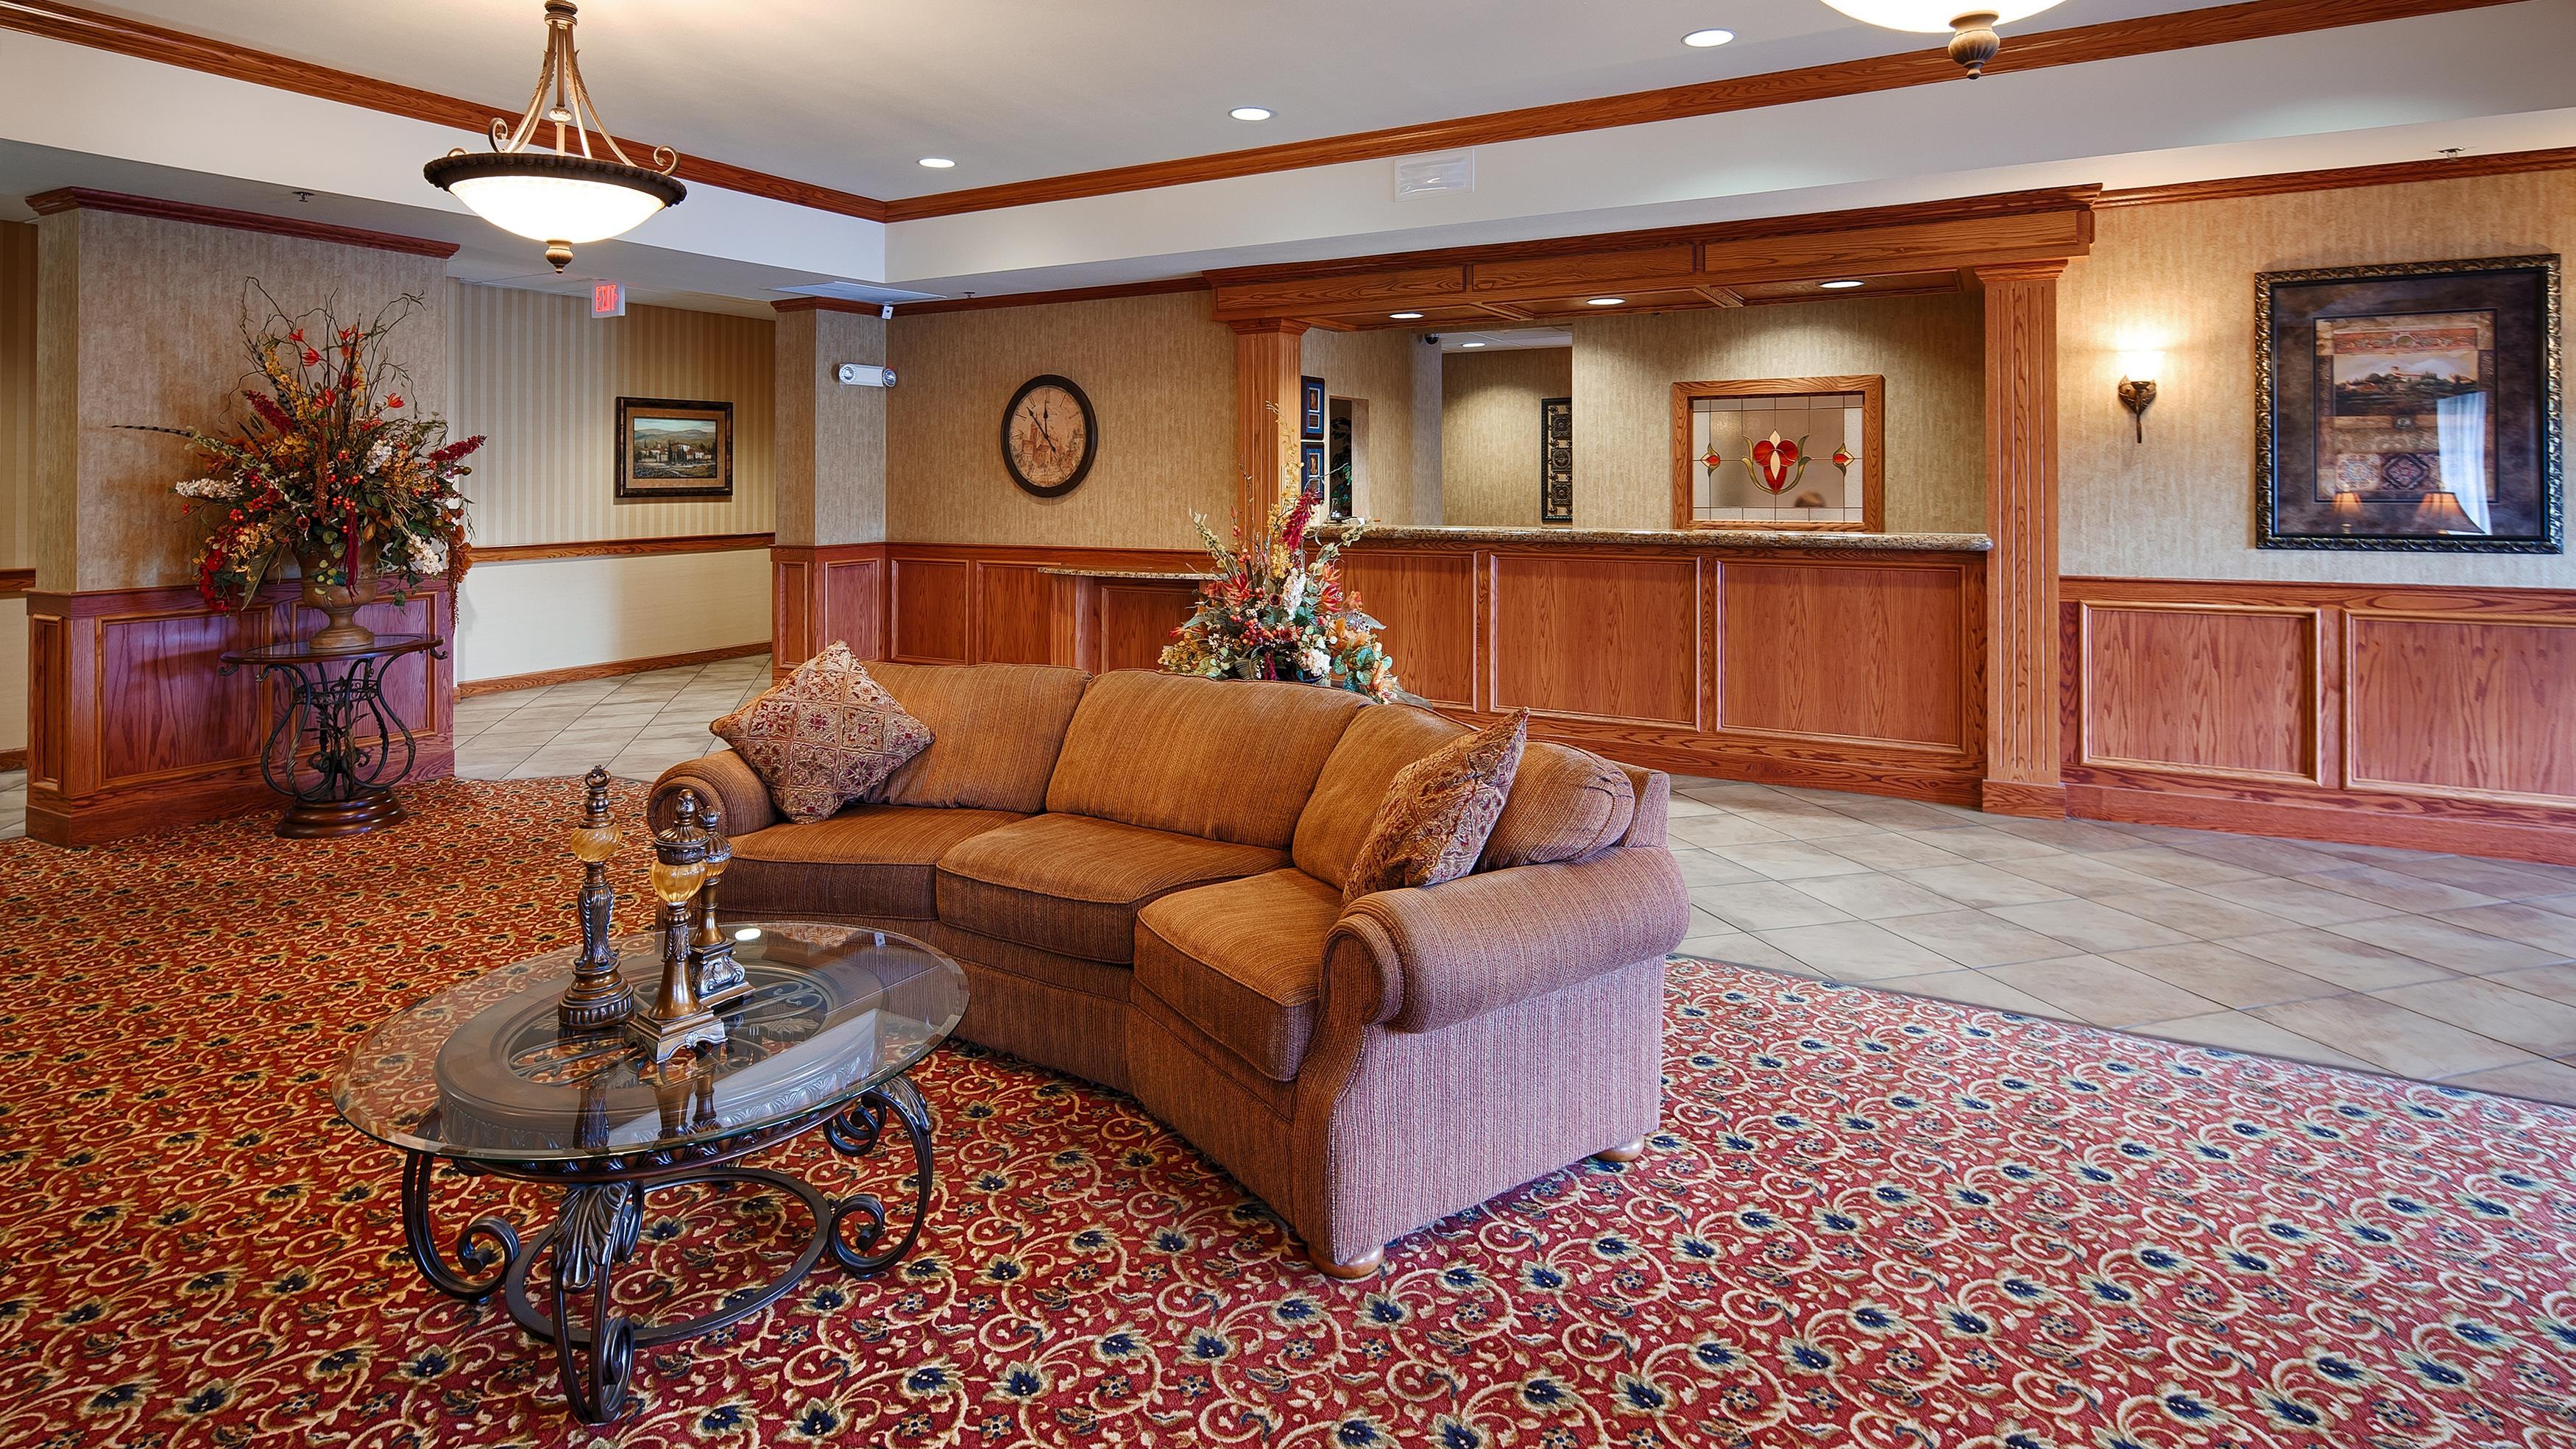 Best Western Plus Capital Inn, Jefferson City MO